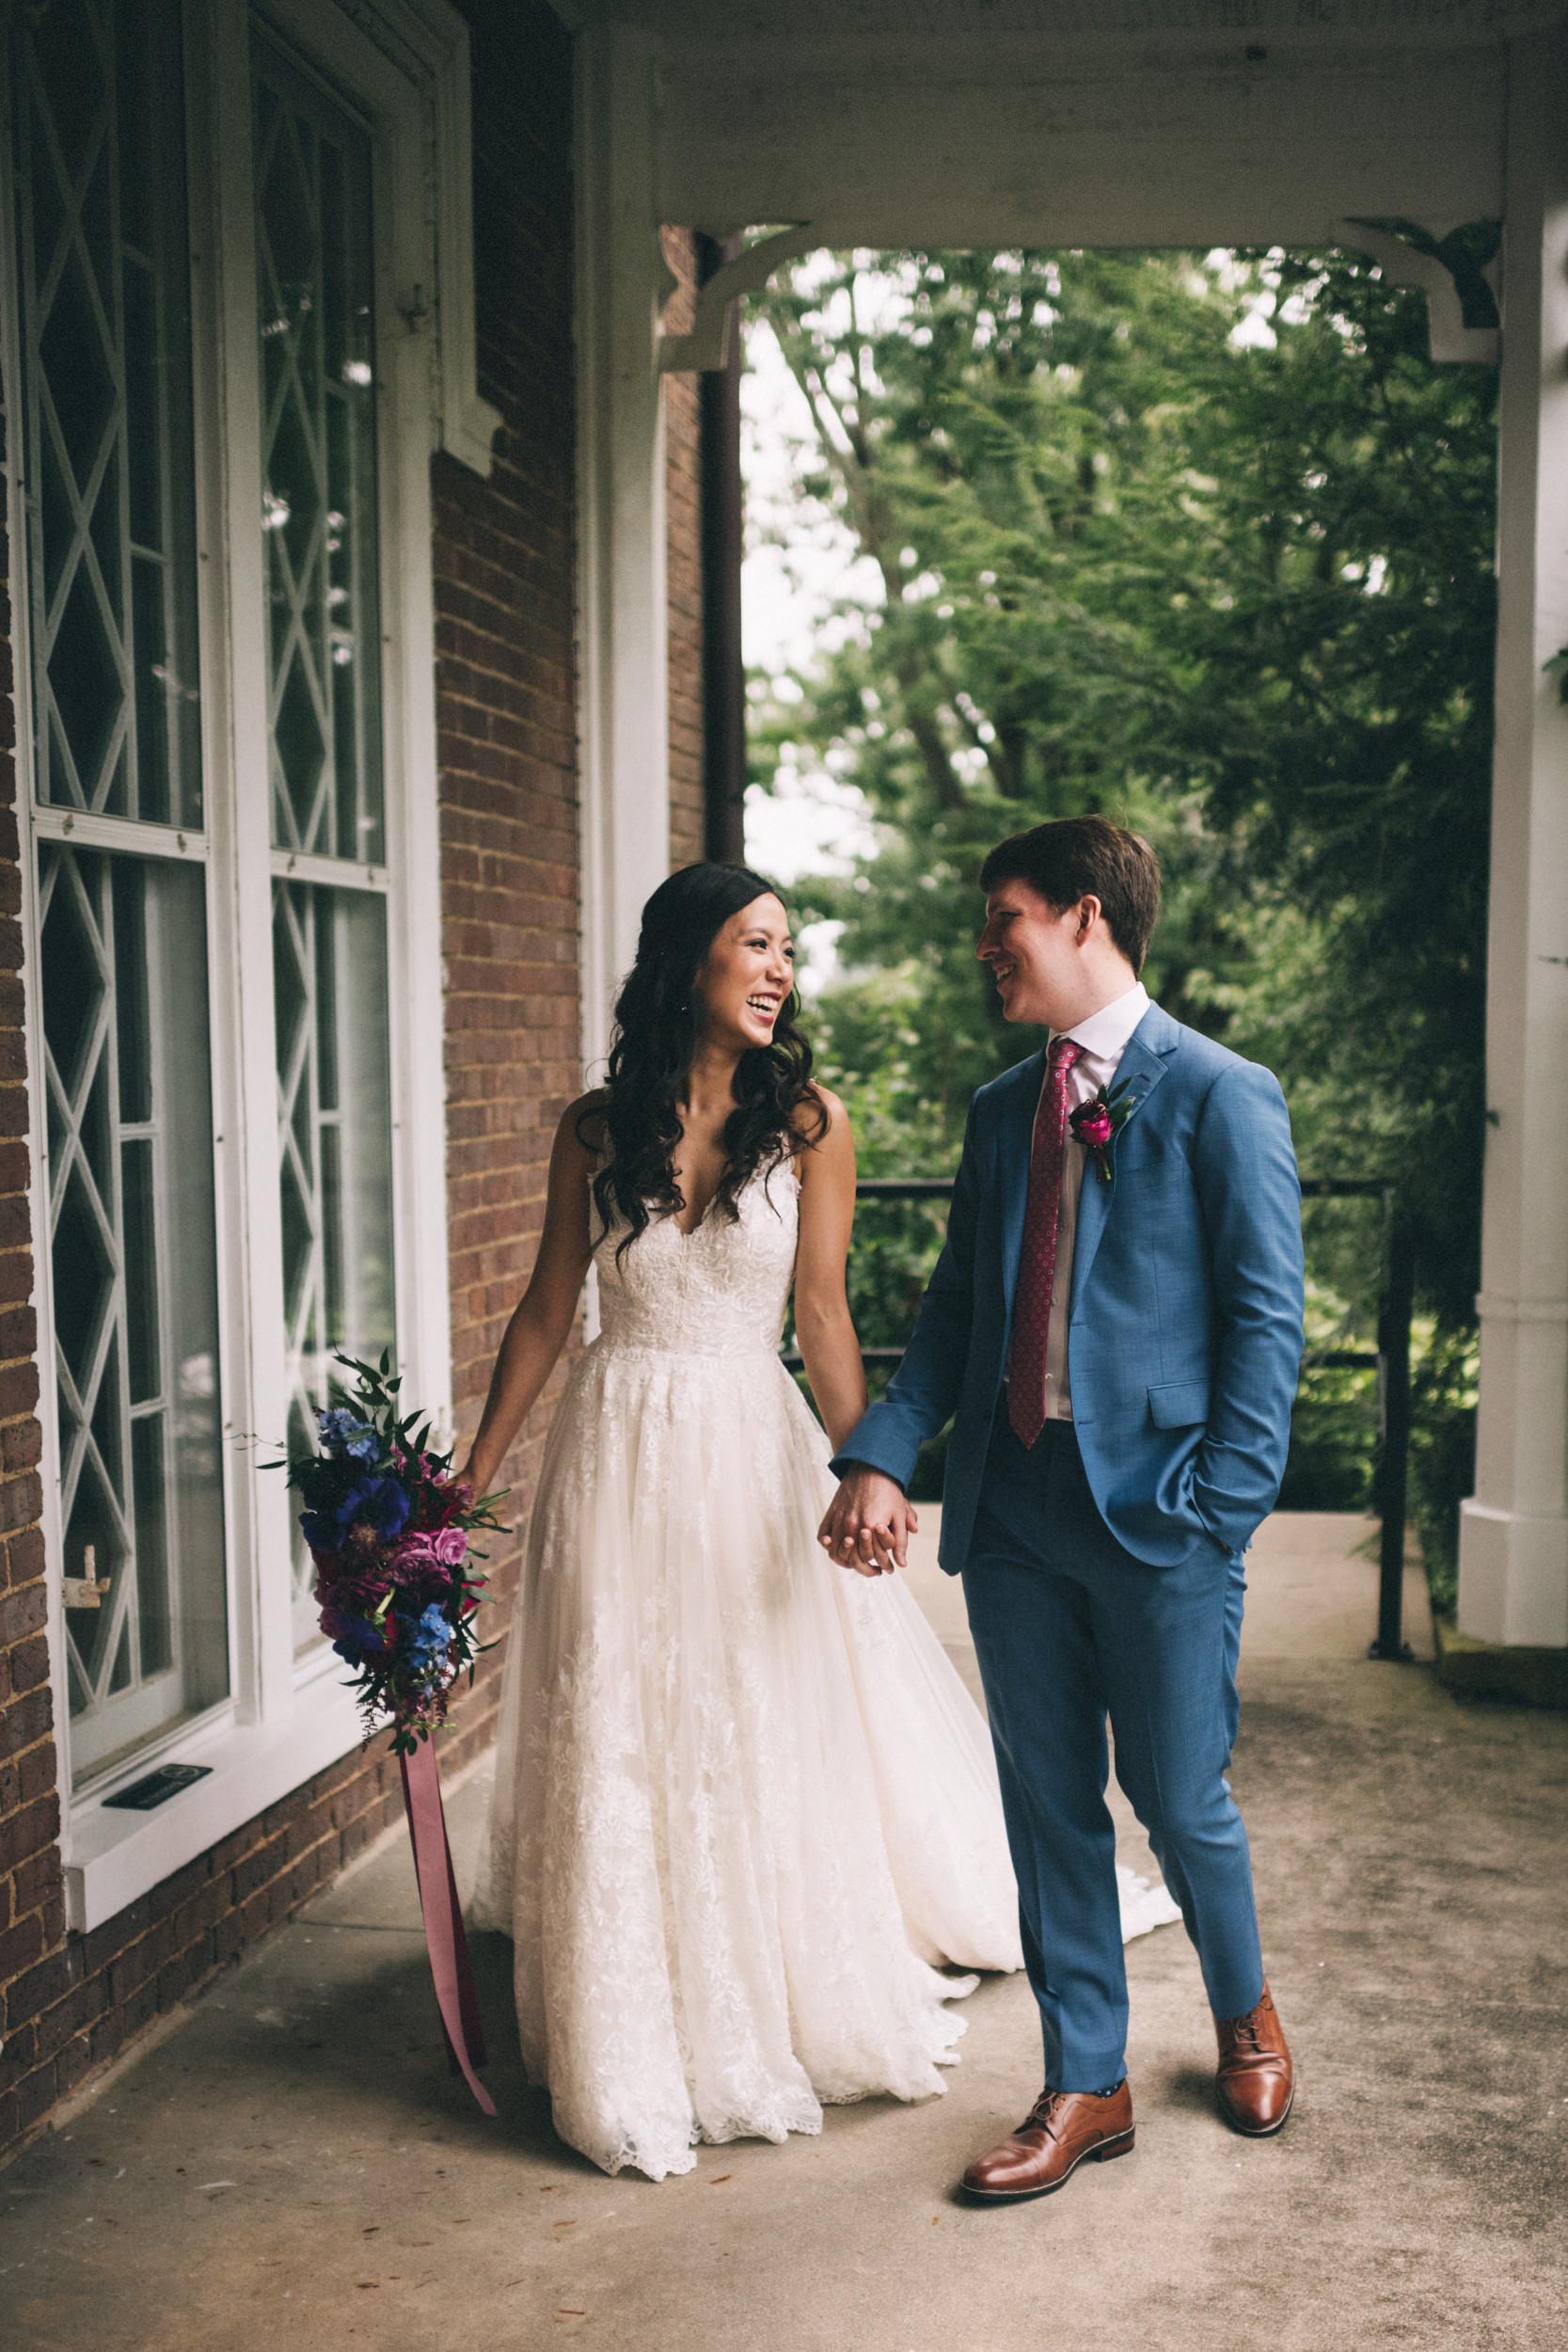 Louisville-Kentucky-Wedding-and-Elopement-Photographer-Sarah-Katherine-Davis-Photography-Summer-Jewel-Toned-Wedding-Chineese-Tea-Ceremony-Warrenwood-Manor-Danville-207.jpg